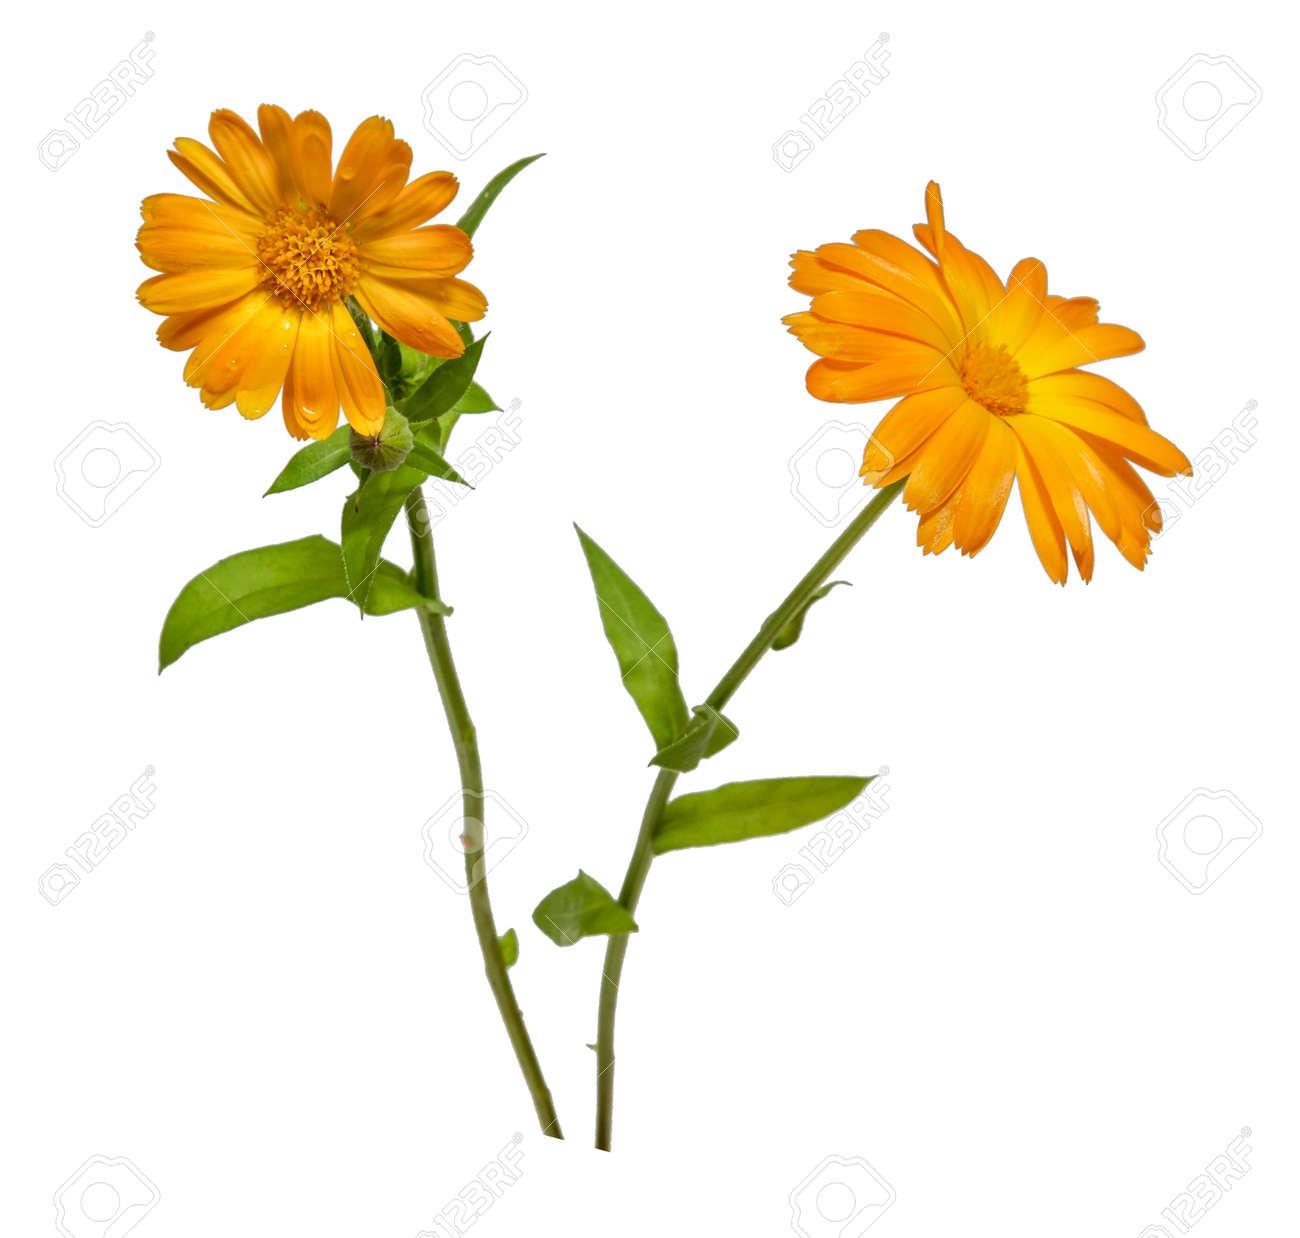 two calendula flower yellow isolated on white background closeup - 130178336